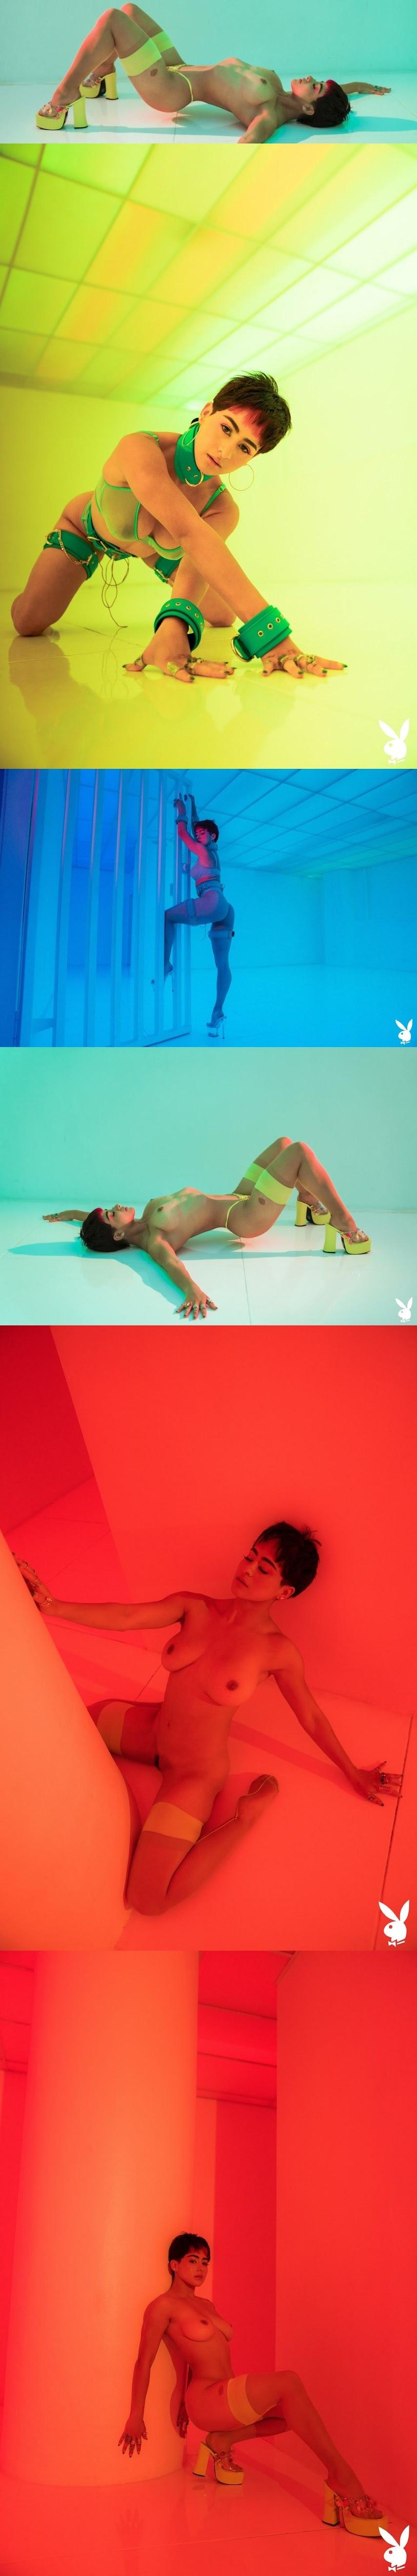 1624246777_miav119_0004 [Playboy Plus] Mia Valentine - Neon Love